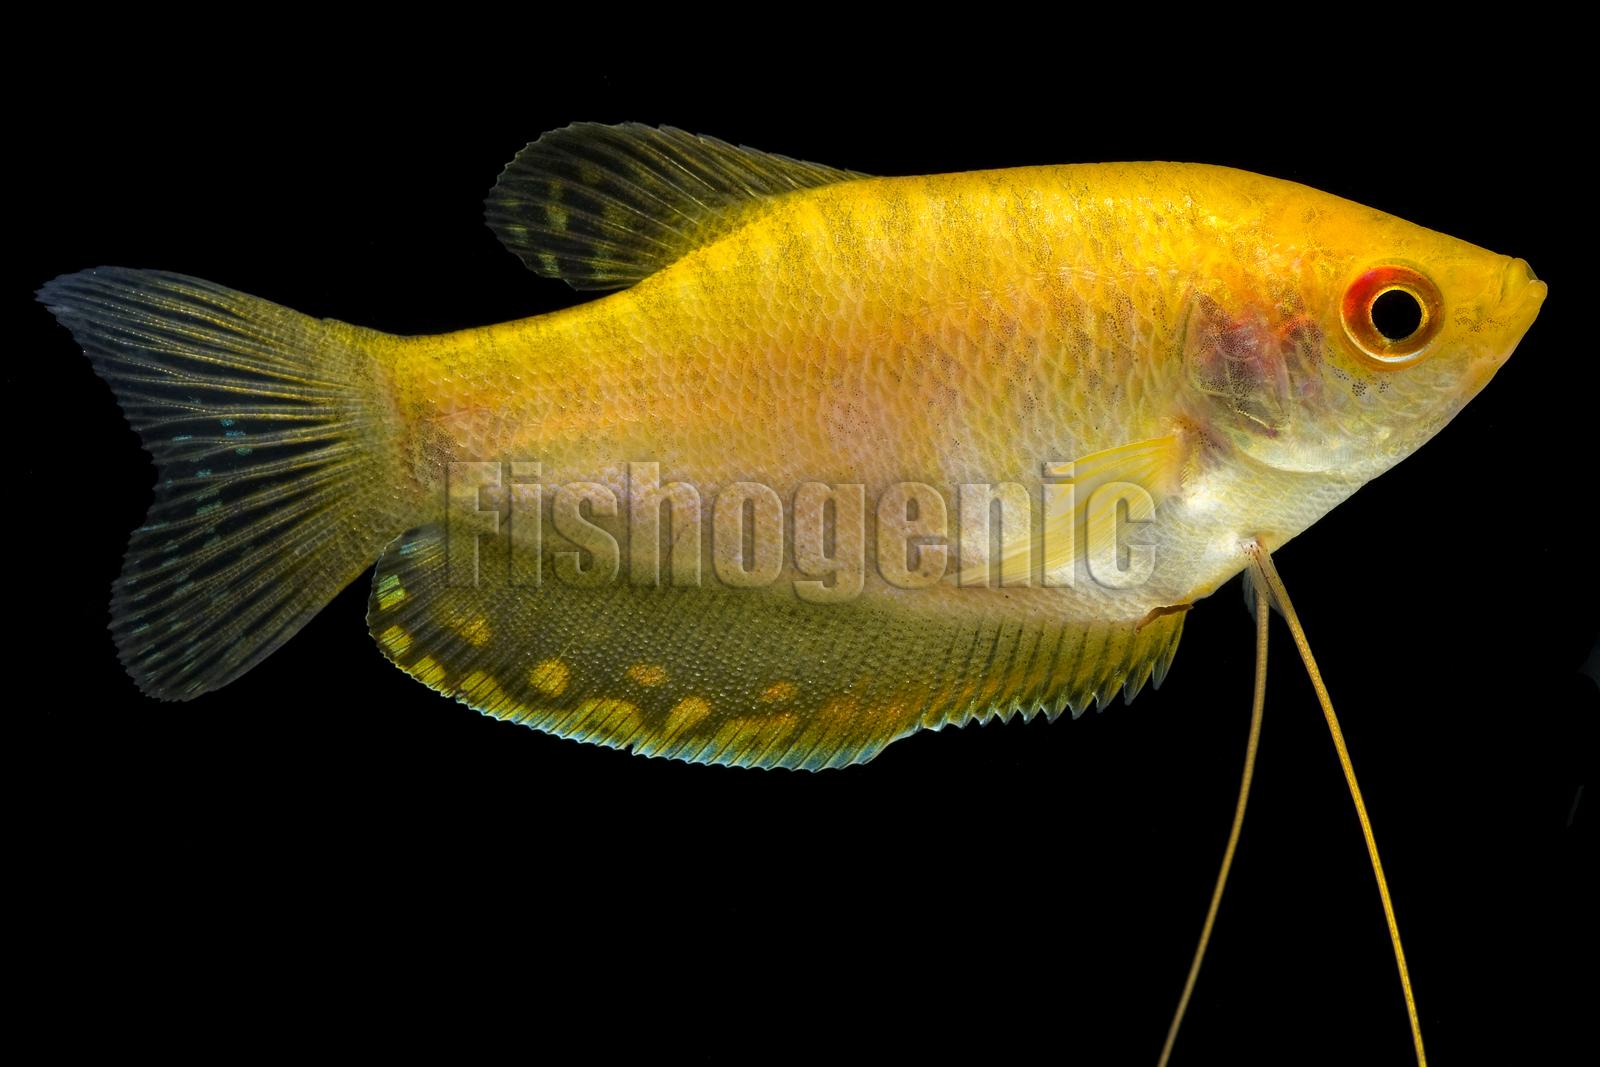 Female blue gourami fish